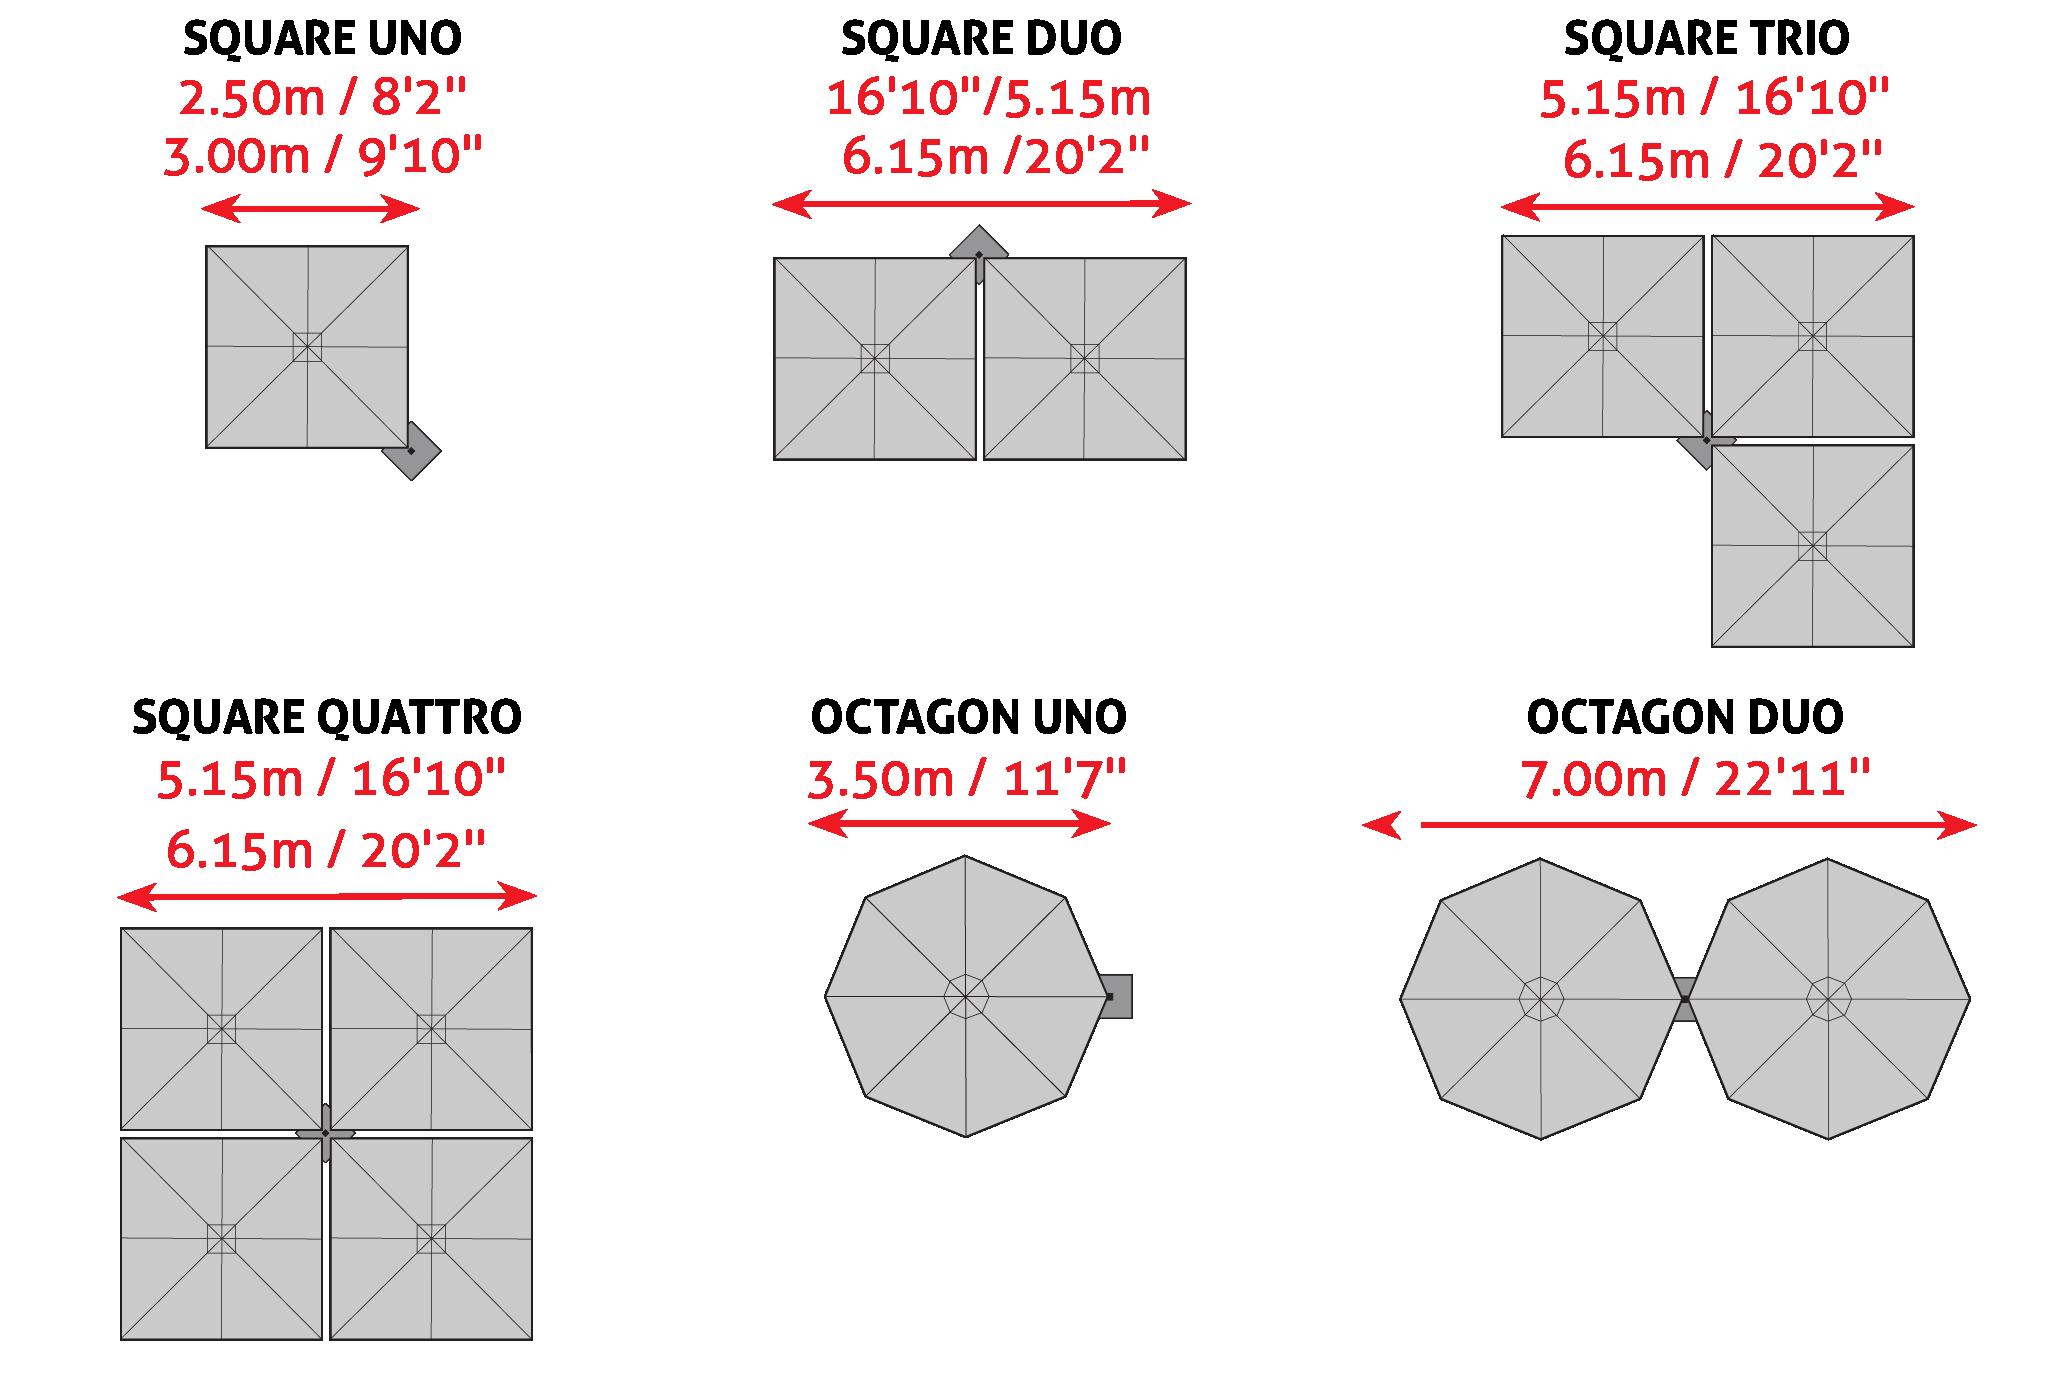 SU6_Sizing_Diagram.png